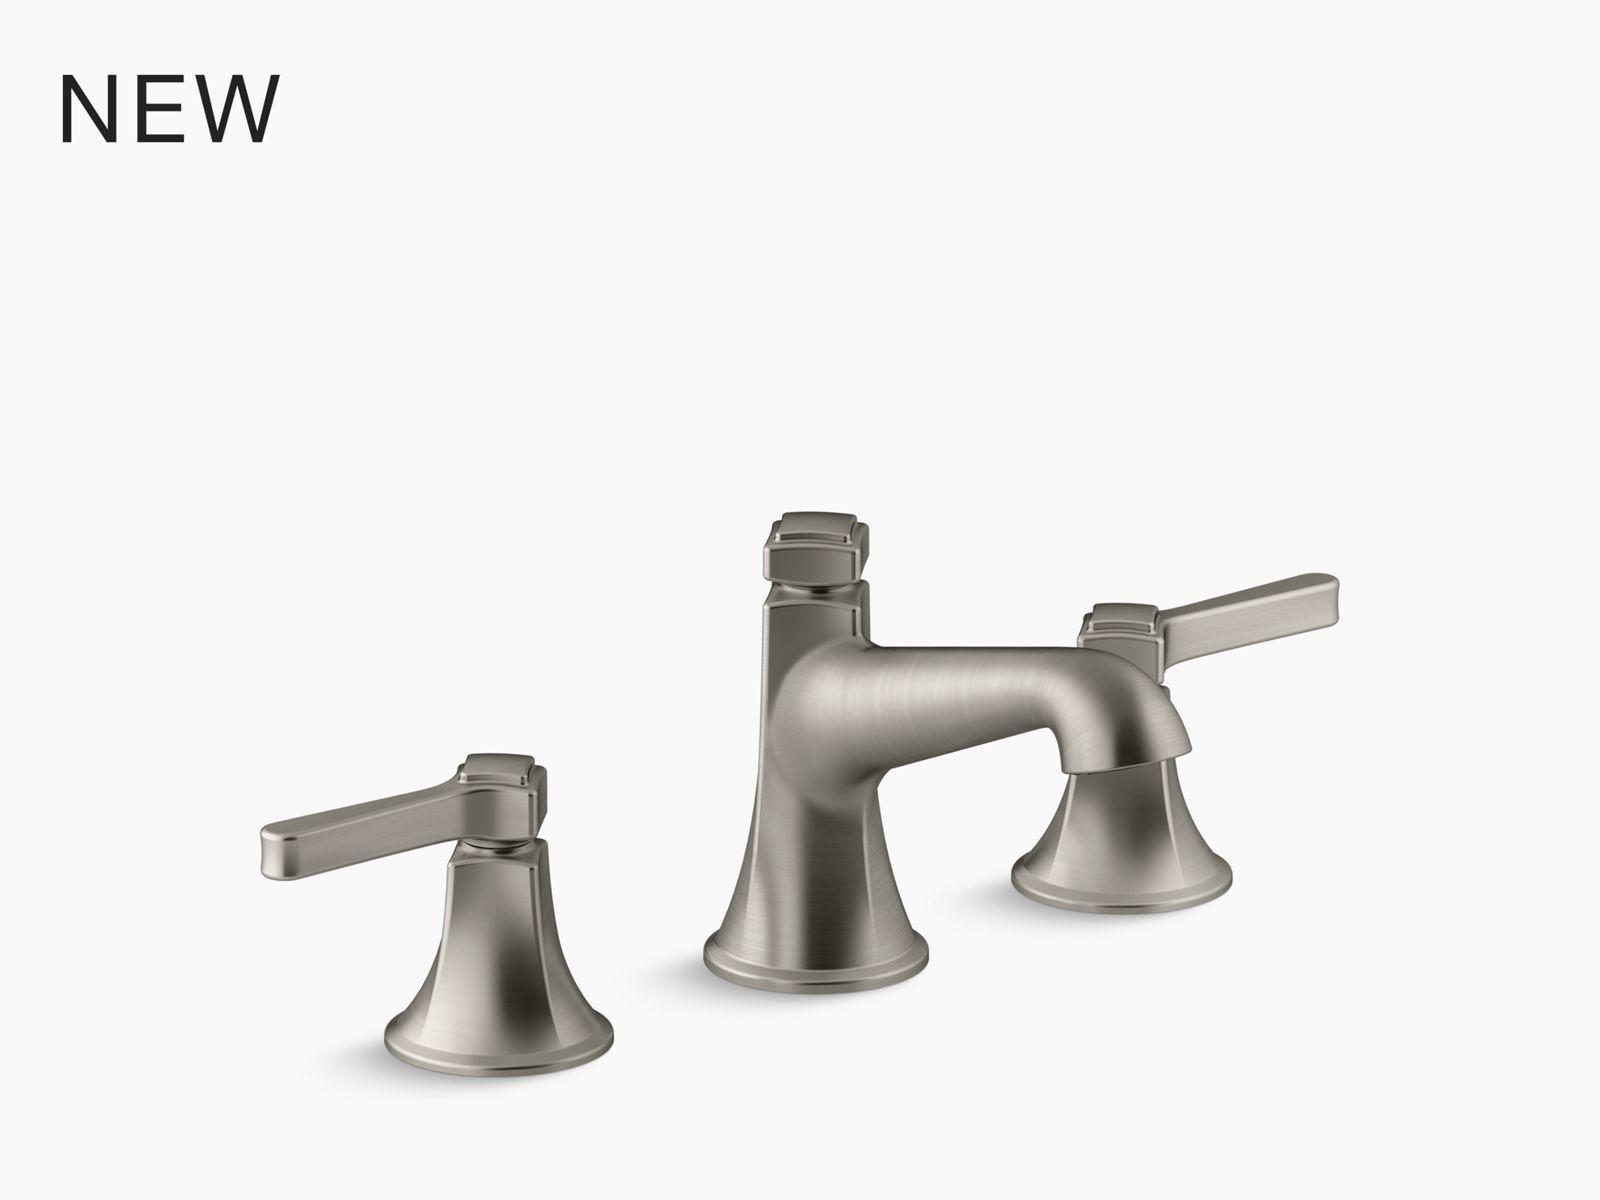 artifacts single hole deck mount pot filler kitchen sink faucet with 22 extended spout